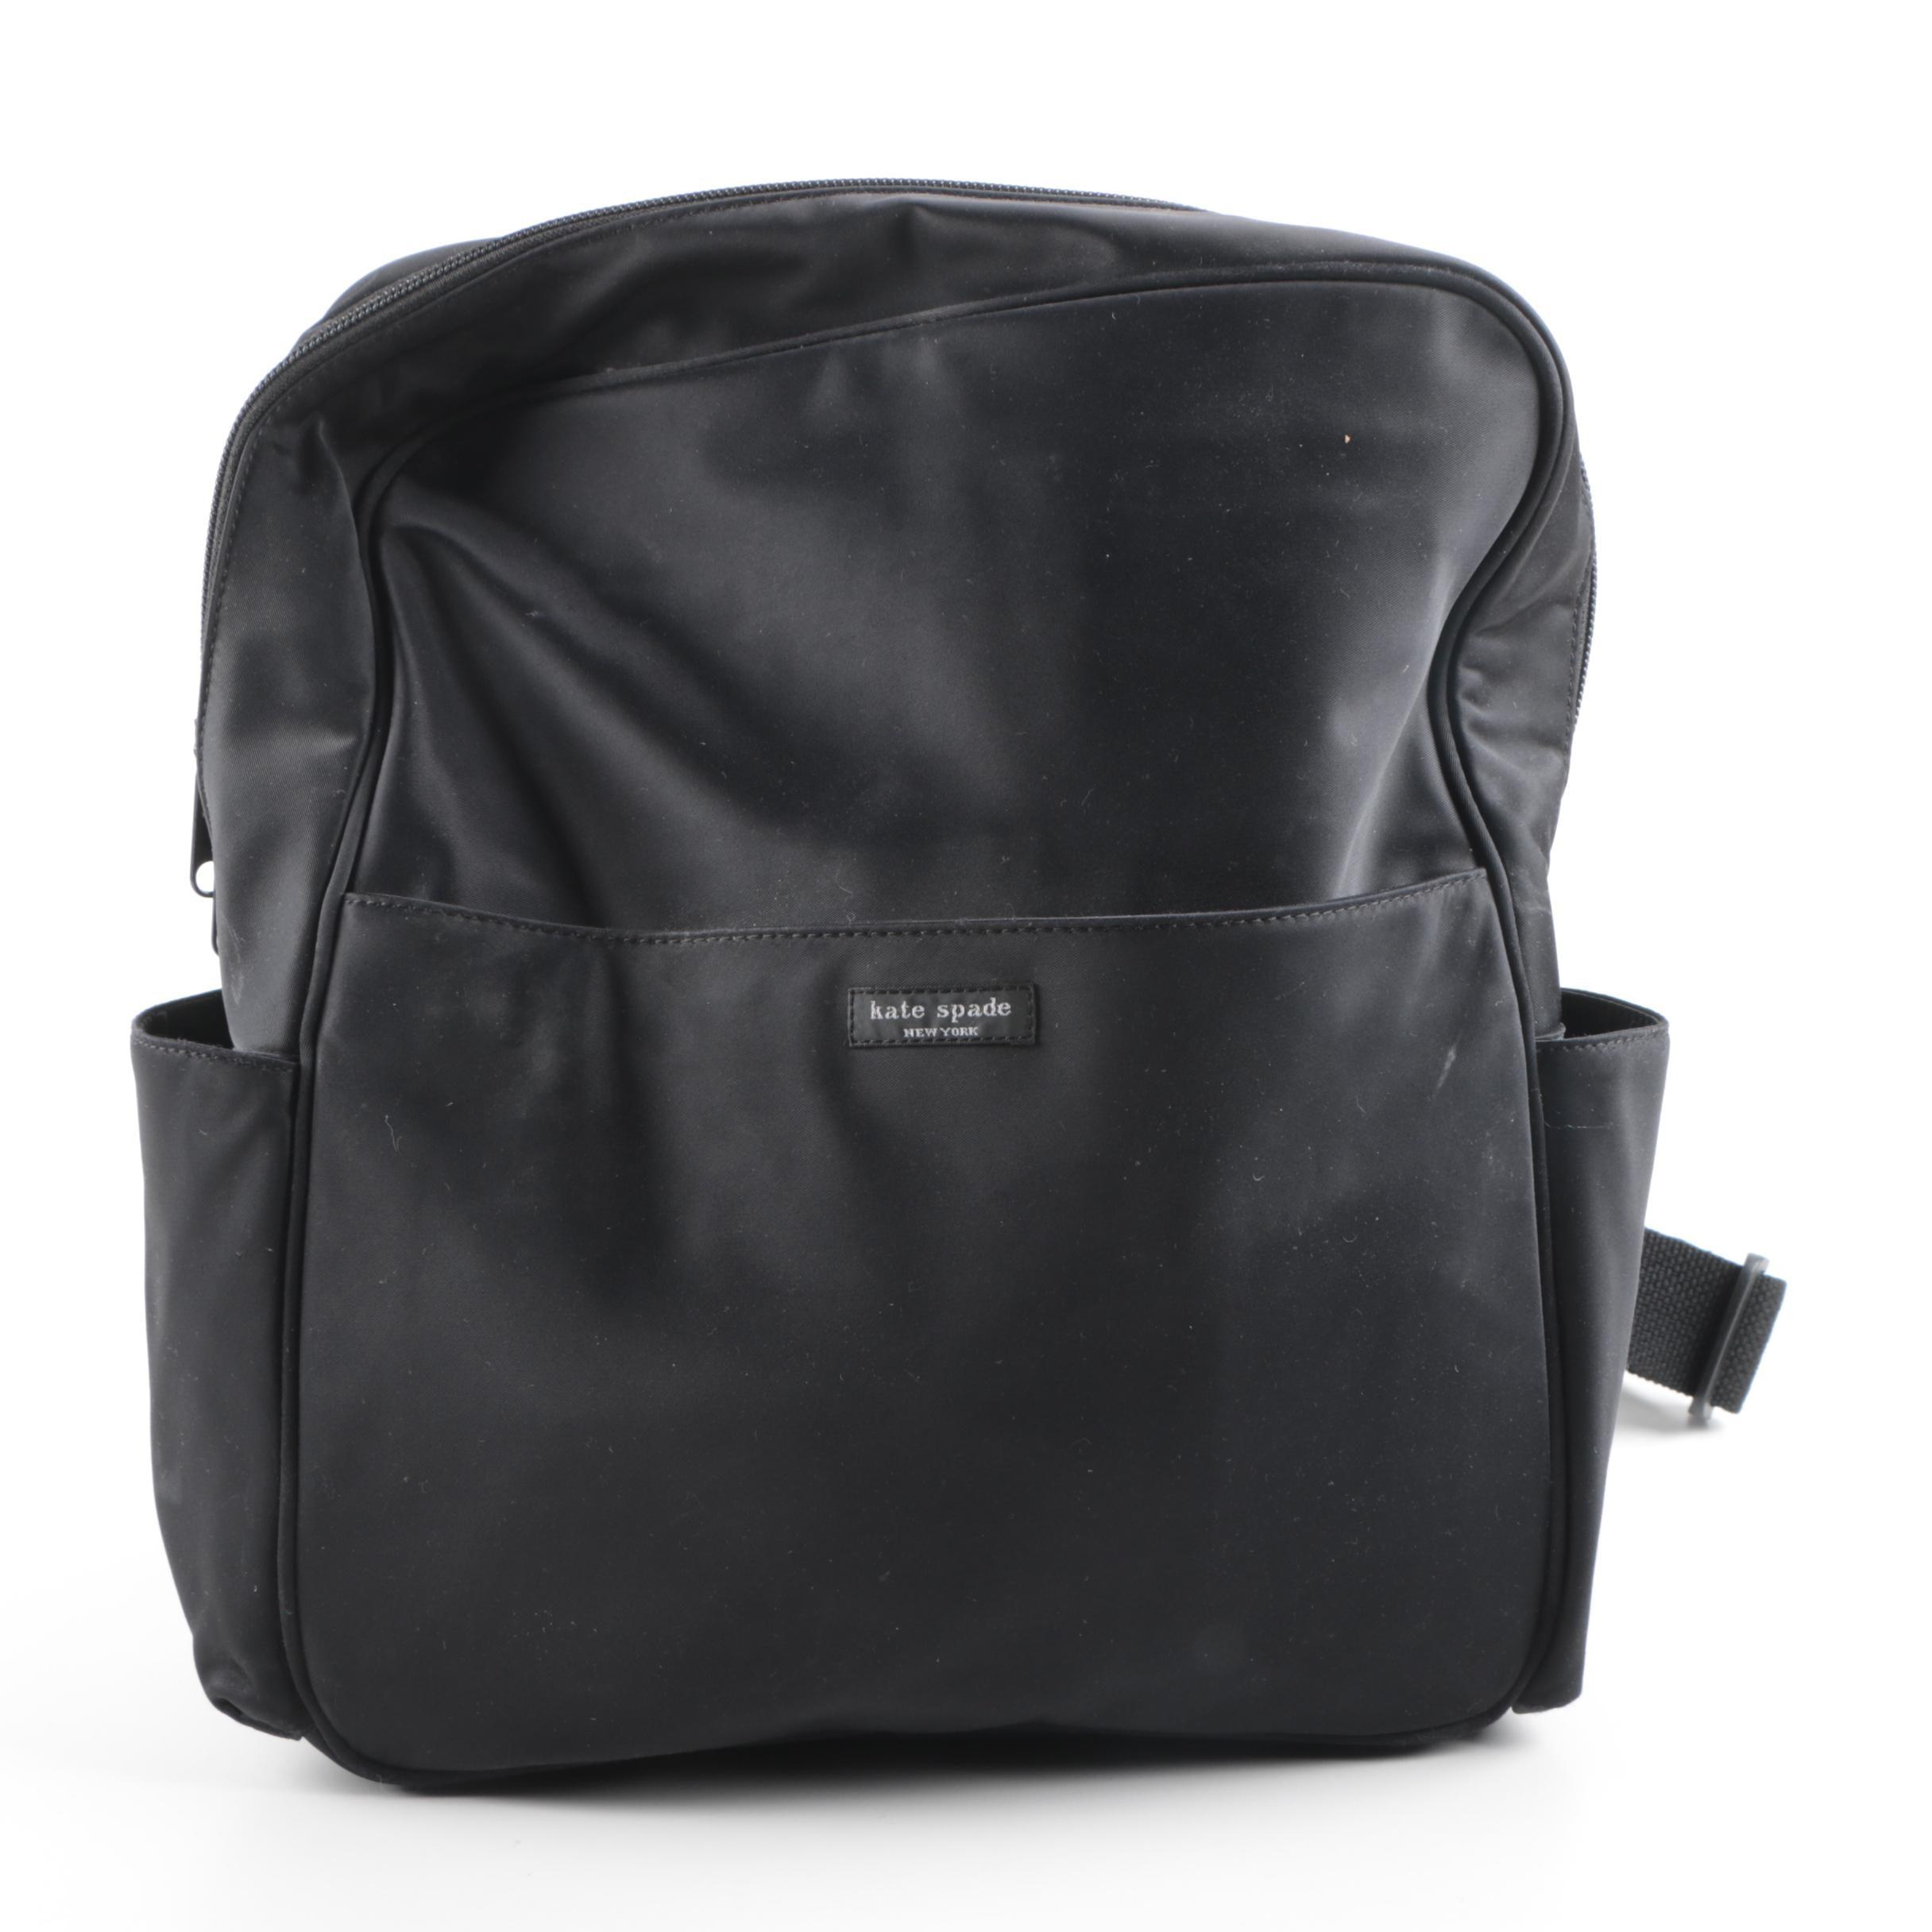 Kate Spade Black Woven Nylon Backpack Bag